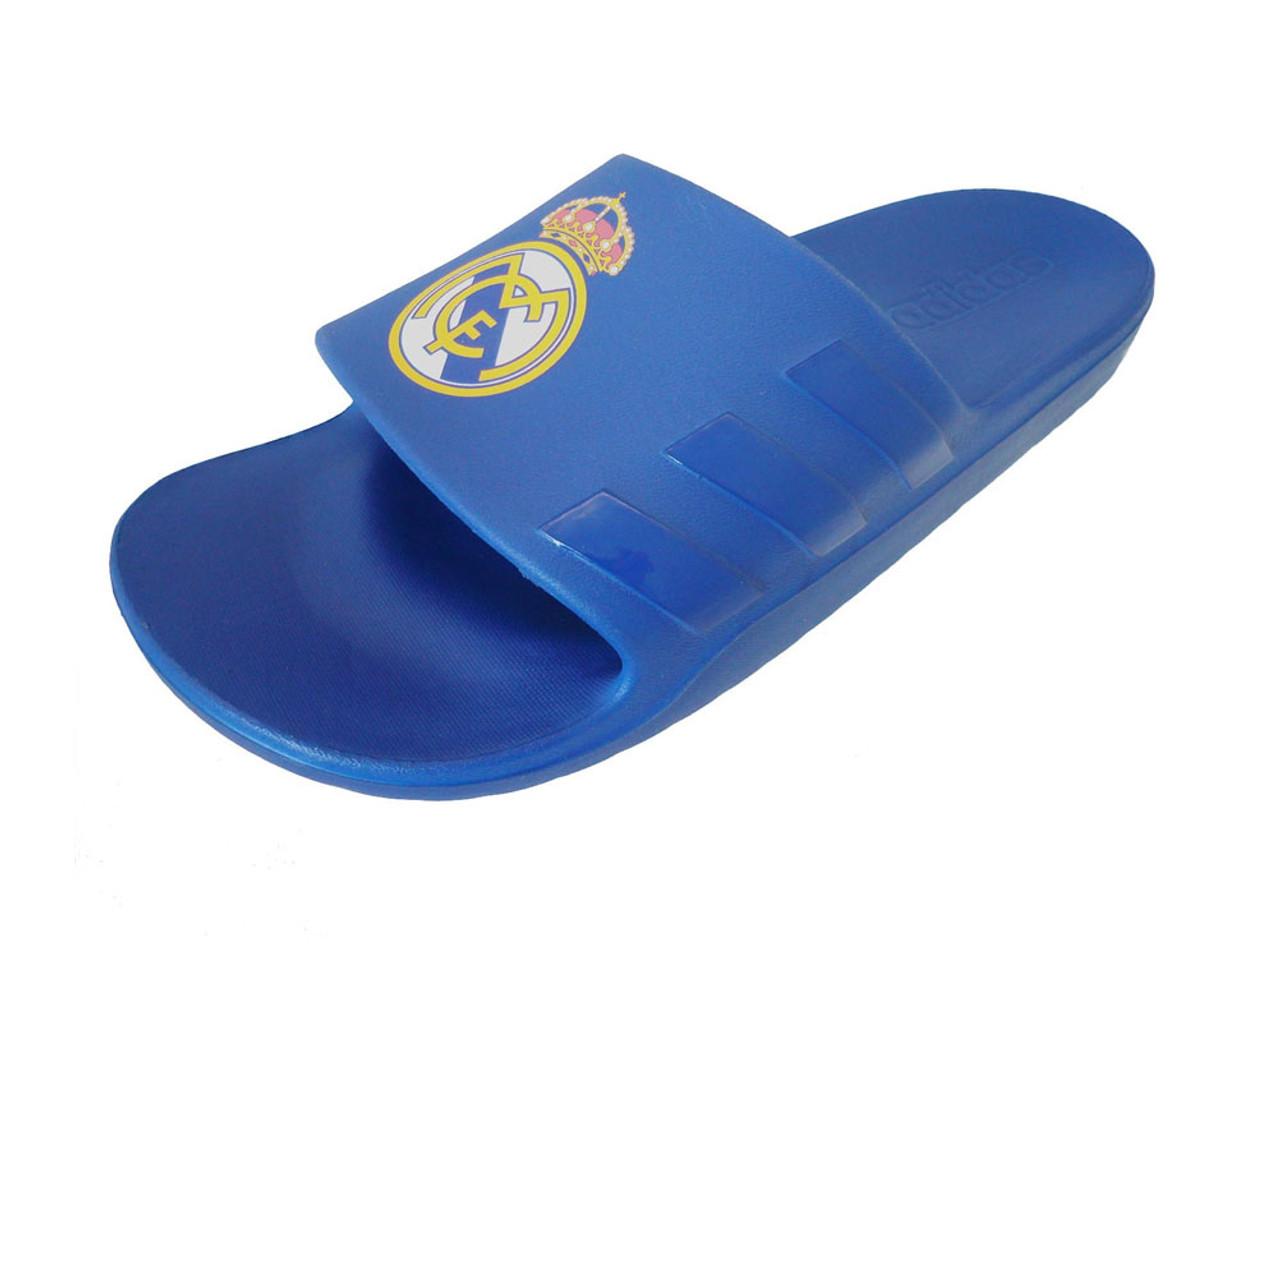 743bf084430731 Adidas aqualette Men s Sandals rm  blue